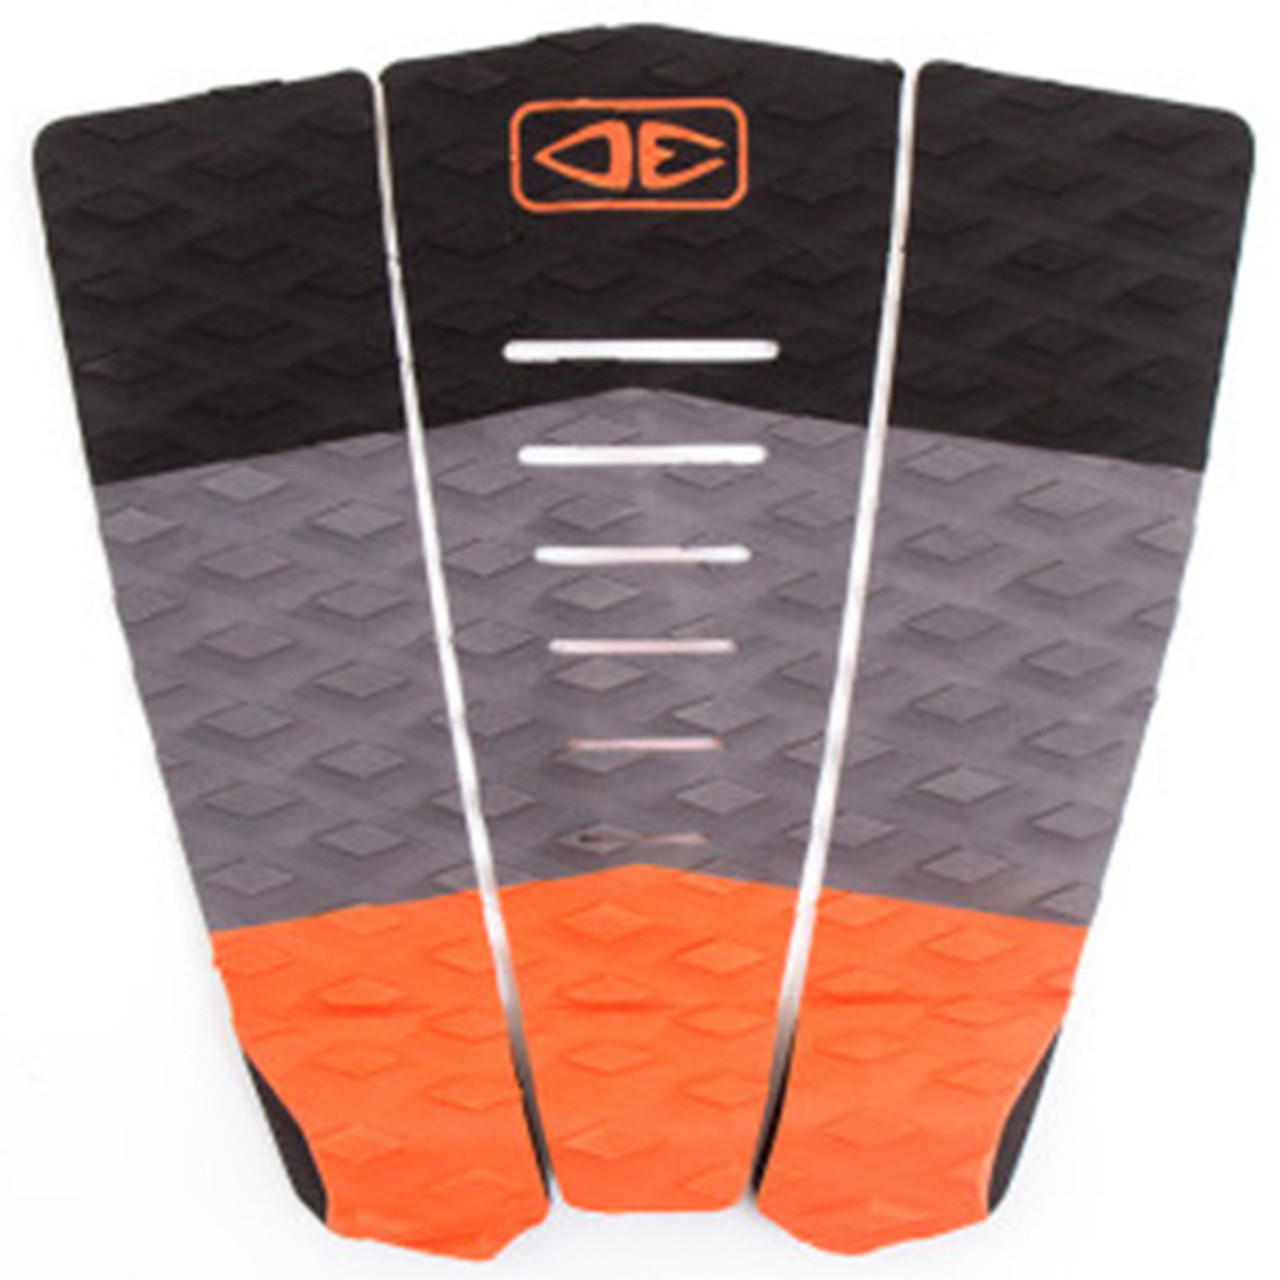 ba783279ee75 Buy Online Surf Shops Australia Kanoa Igarashi Surfboard Tail Pad Deck Grip  Traction Pad